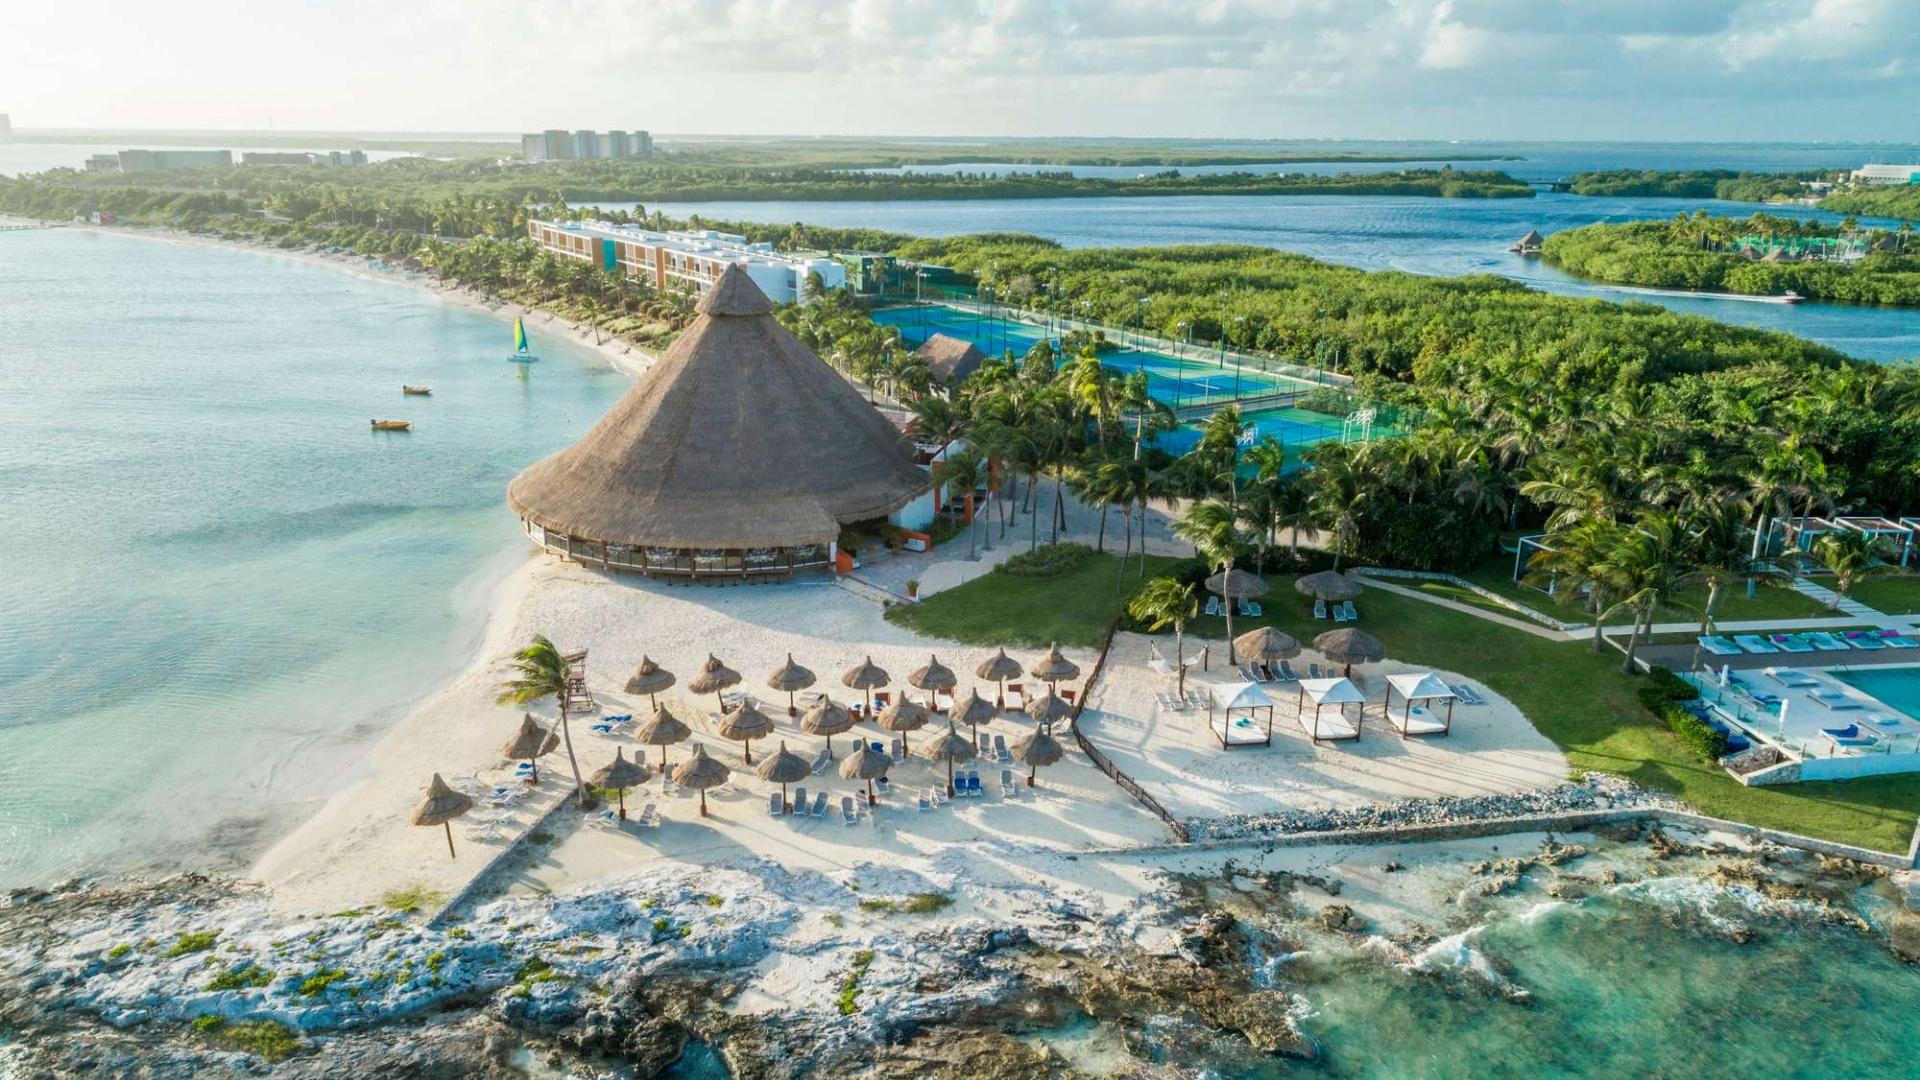 Club Med's Cancún Yucatán resort in Mexico